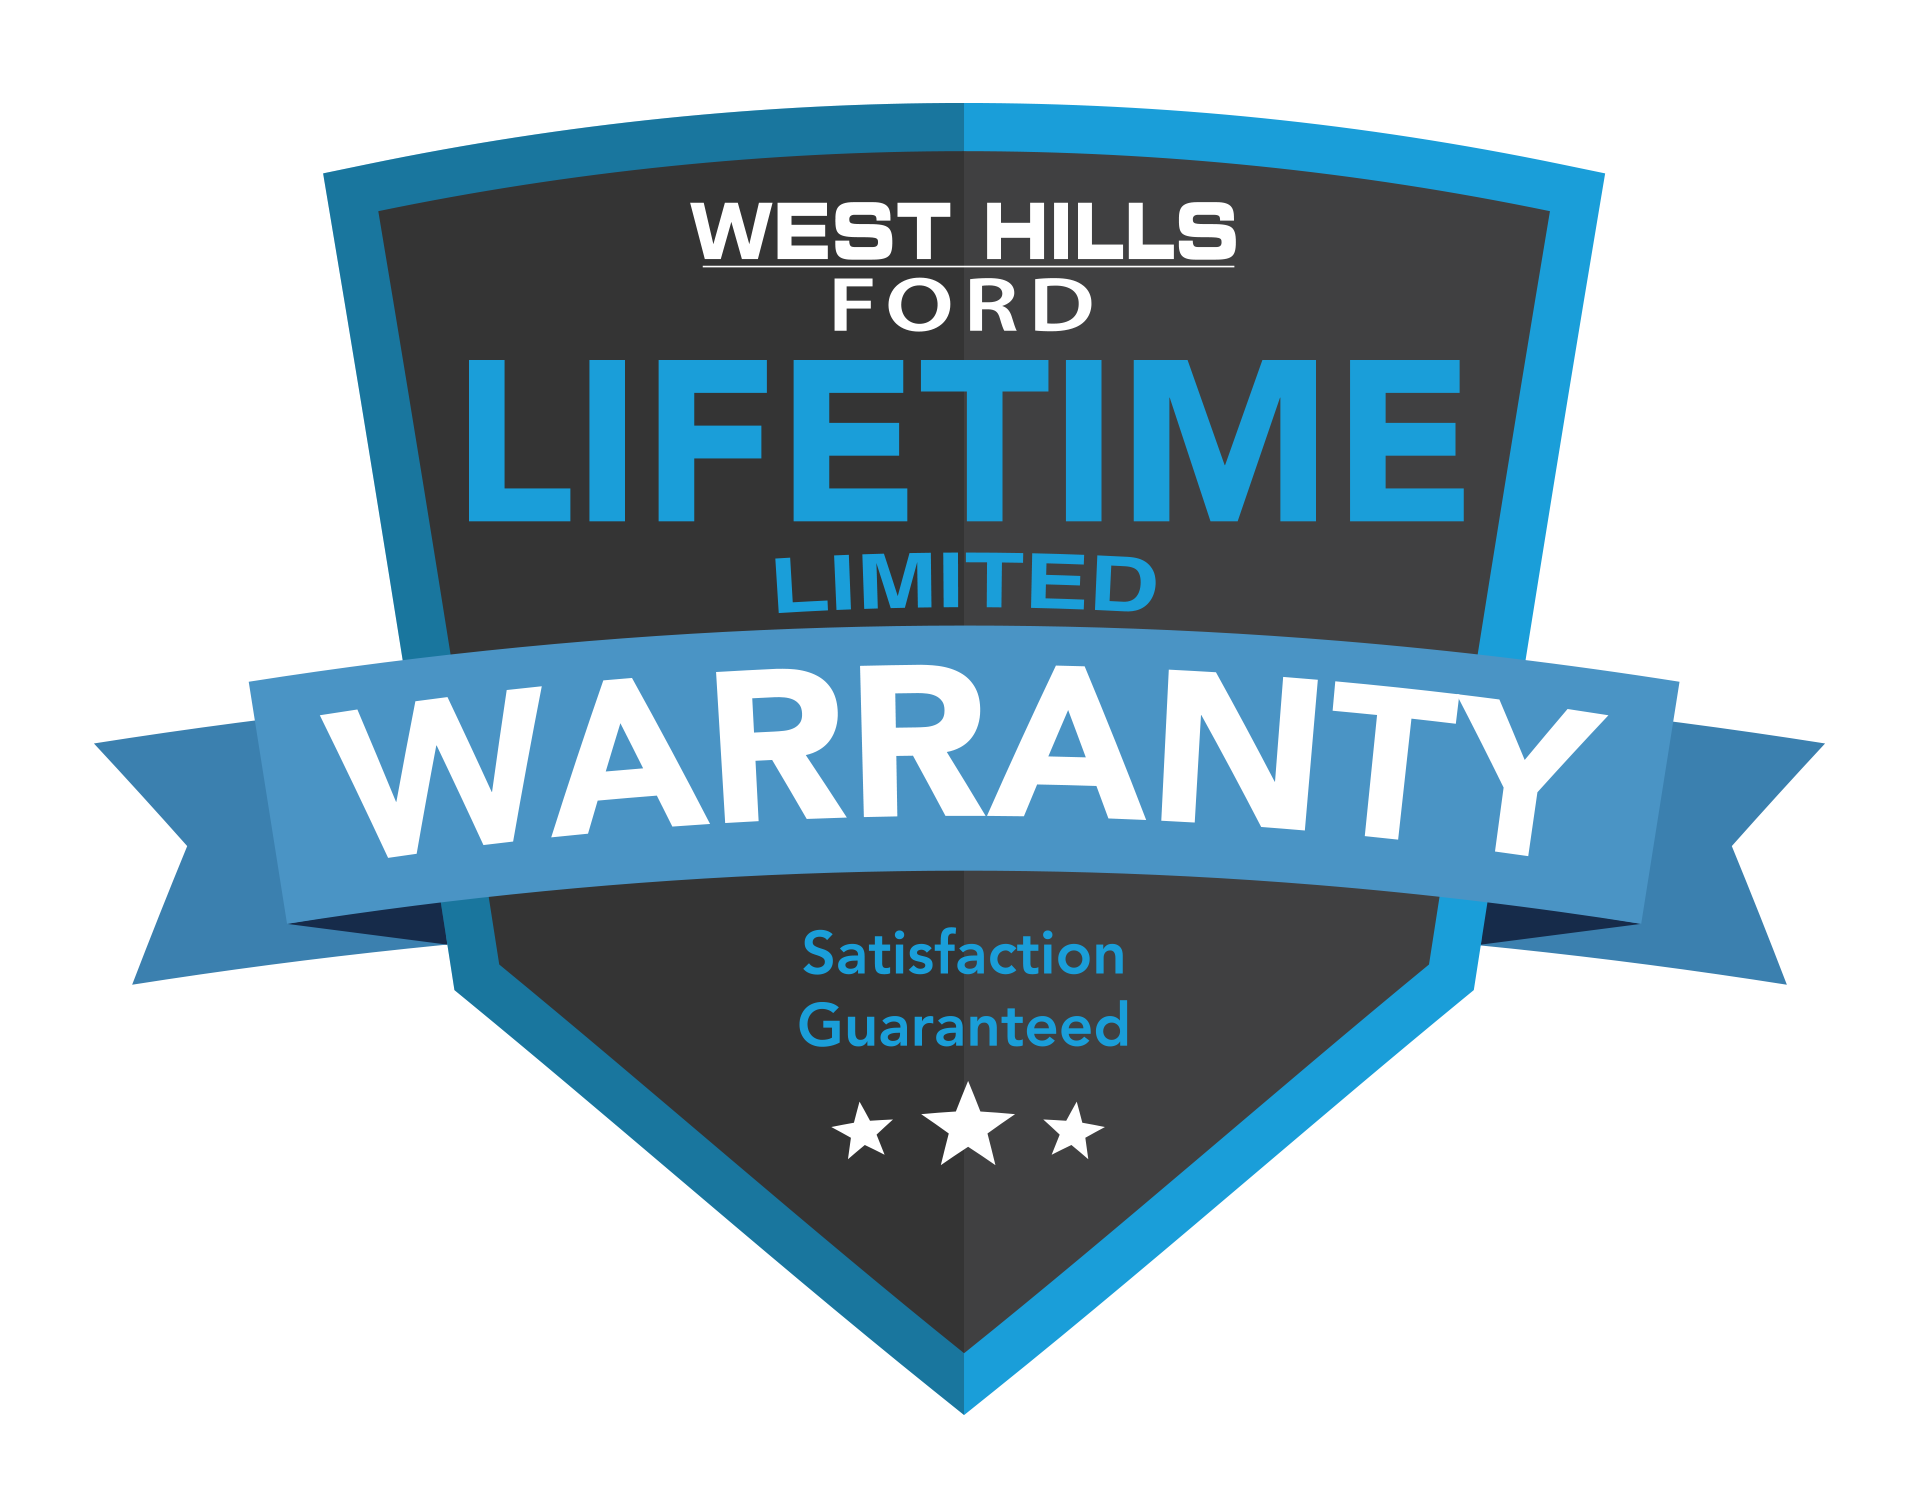 Lifetime Warranty West Hills Ford Bremerton Wa